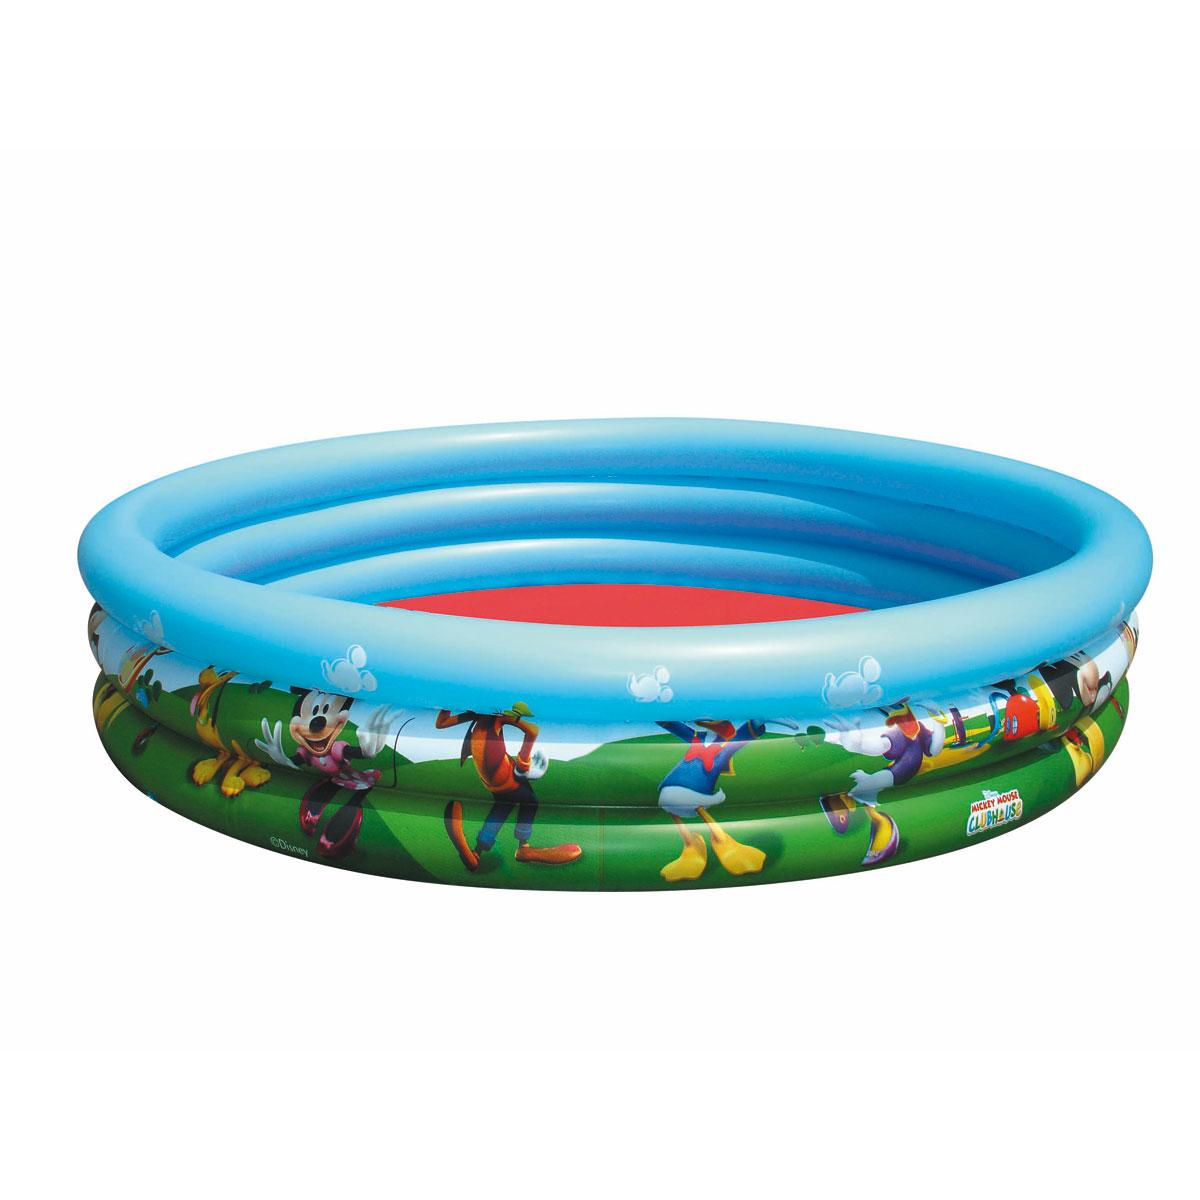 Les piscines hors sol agence briques en stock for Piscine hors sol qui s effondre